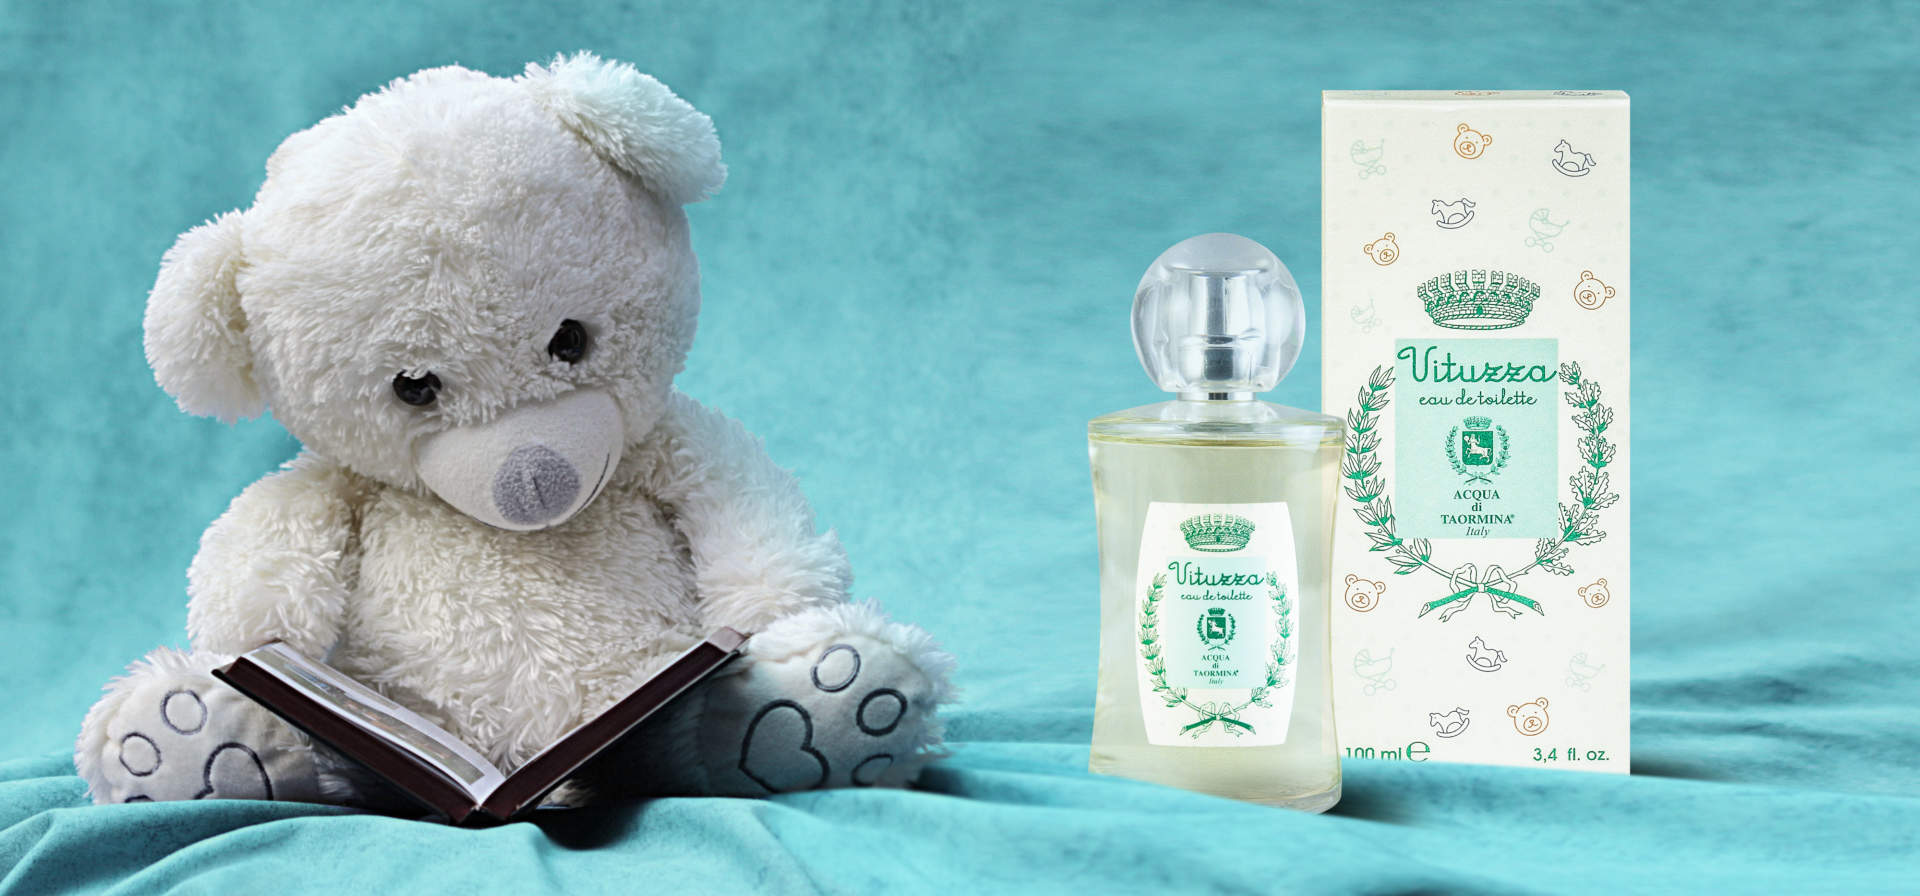 Acqua di Taormina parfums vituzza_orso-2 Vituzza